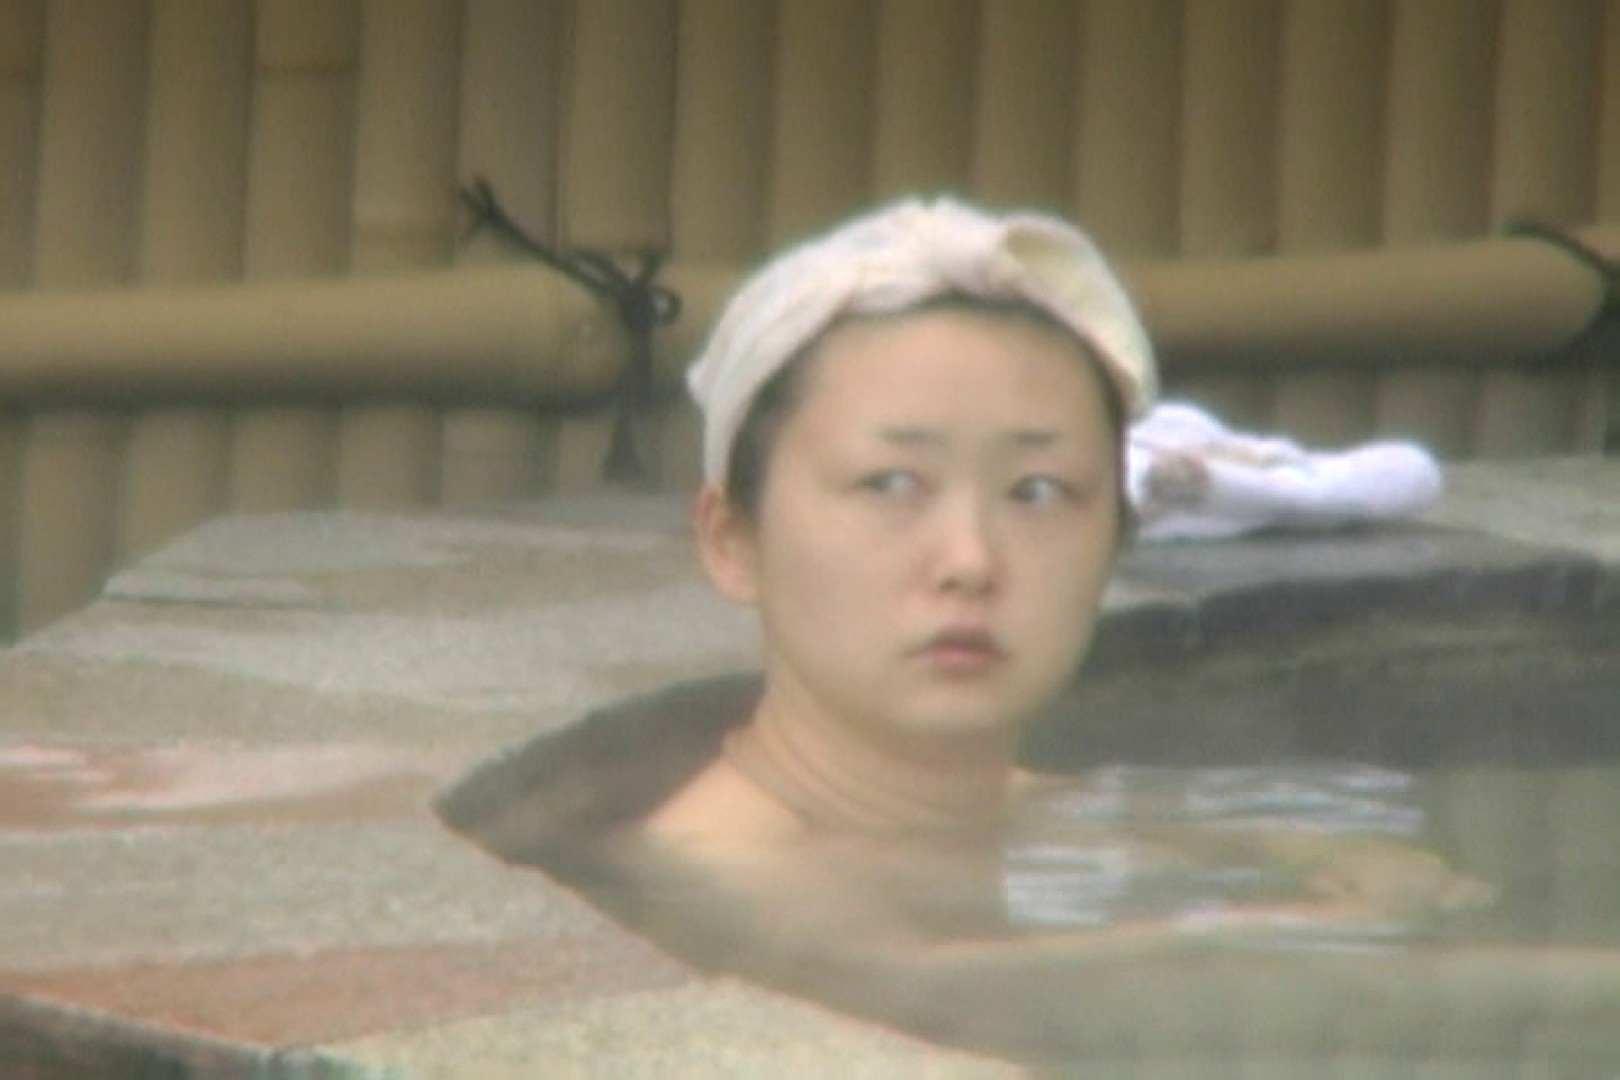 Aquaな露天風呂Vol.564 OL  87連発 61